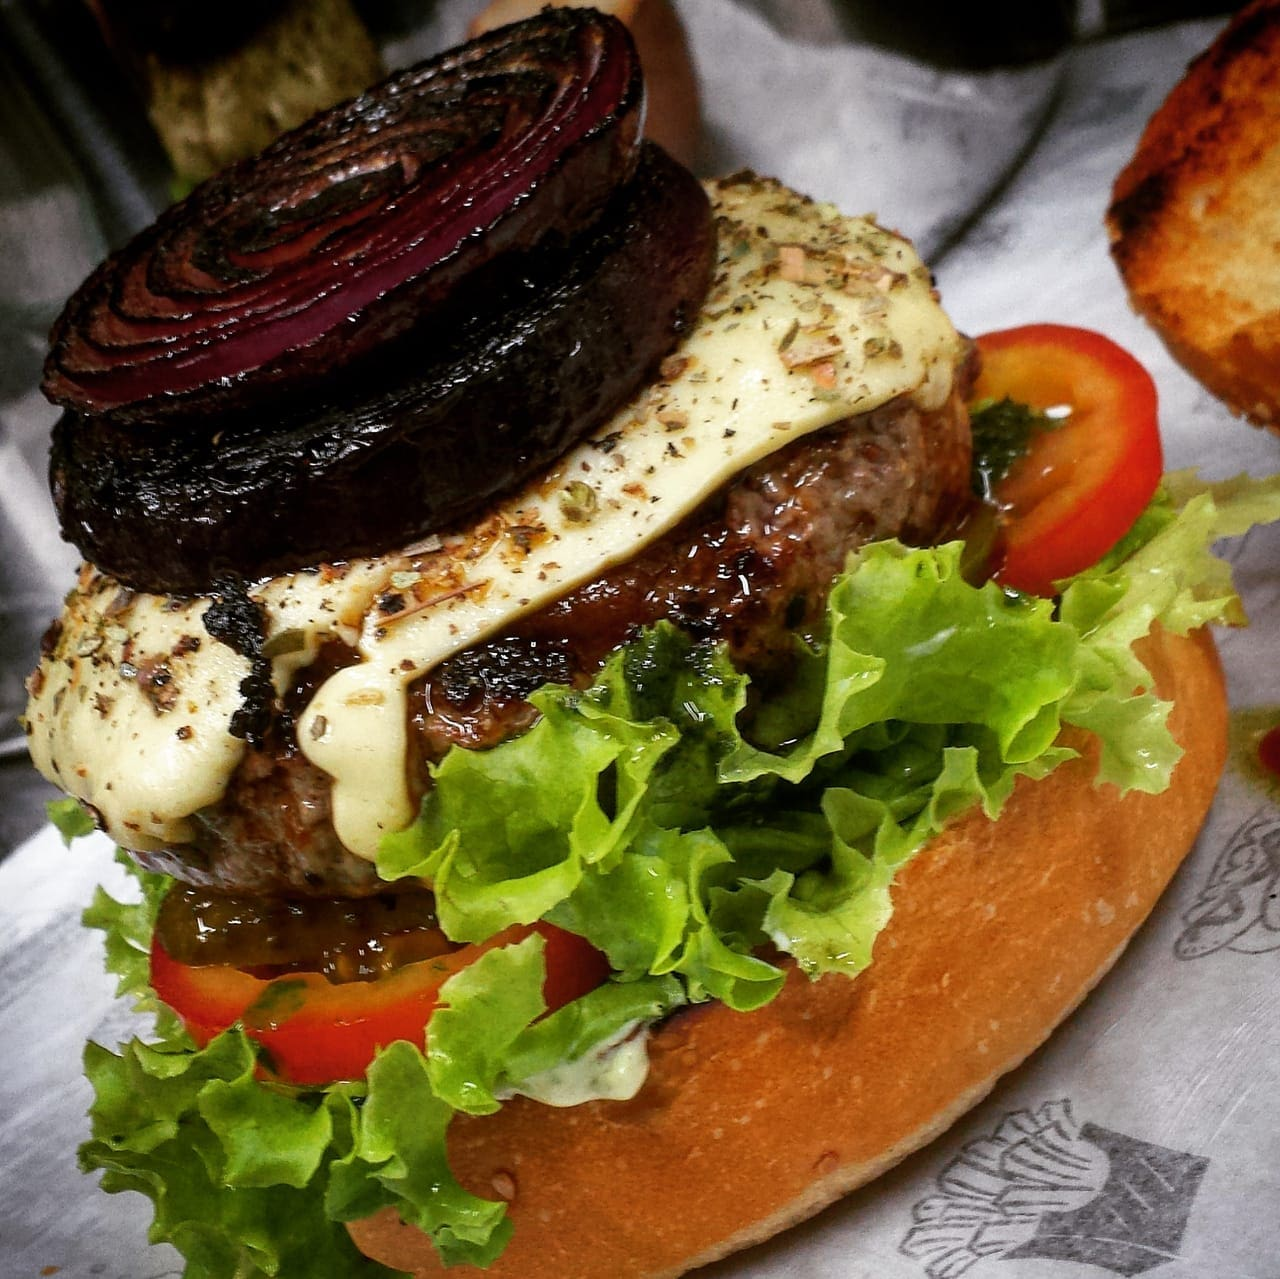 Durayski's Gourmet Burger & Hot Dog